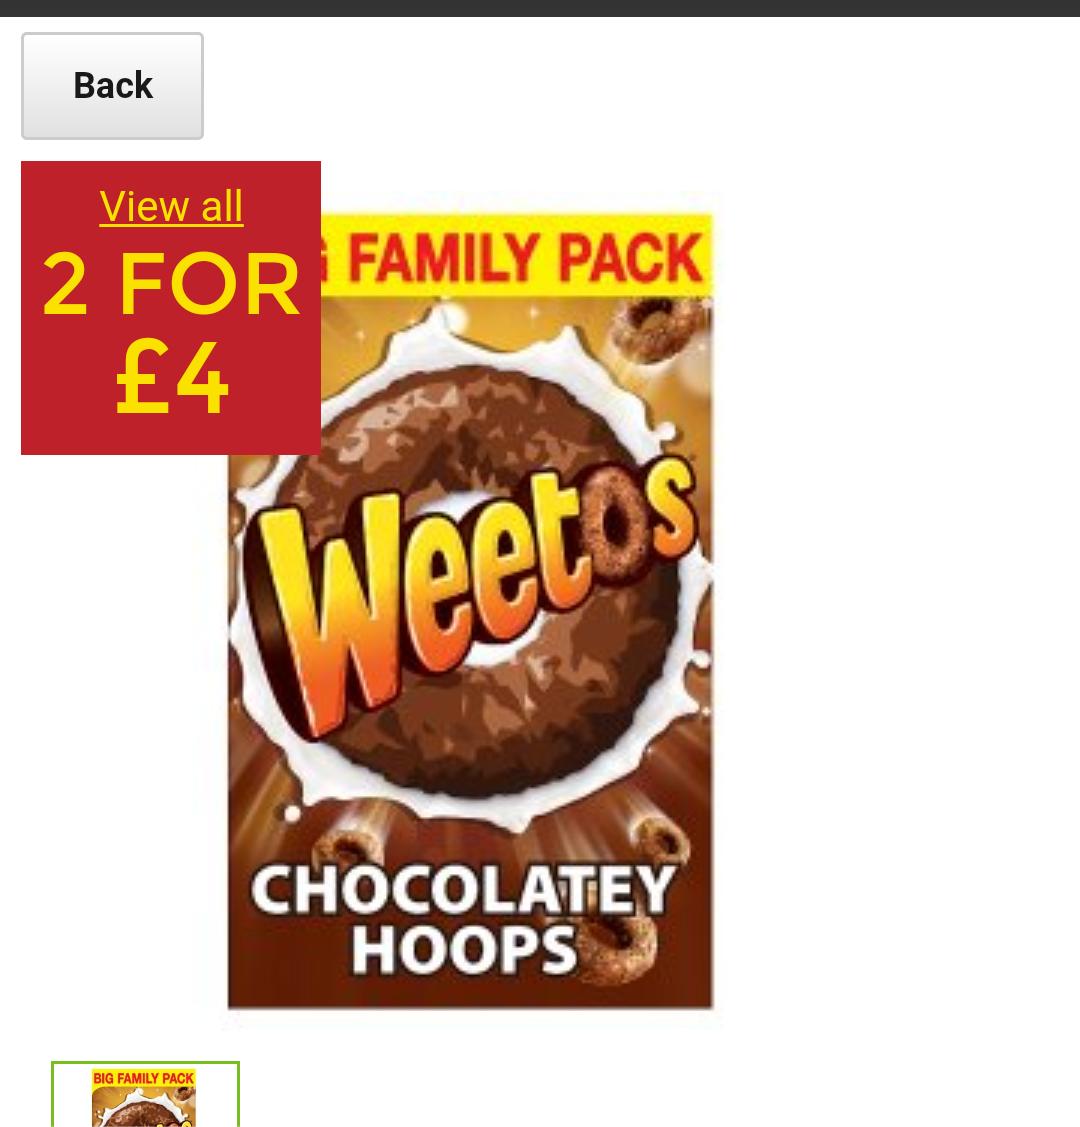 Weetos chocolate hoops 500g 2 for £4 at Asda